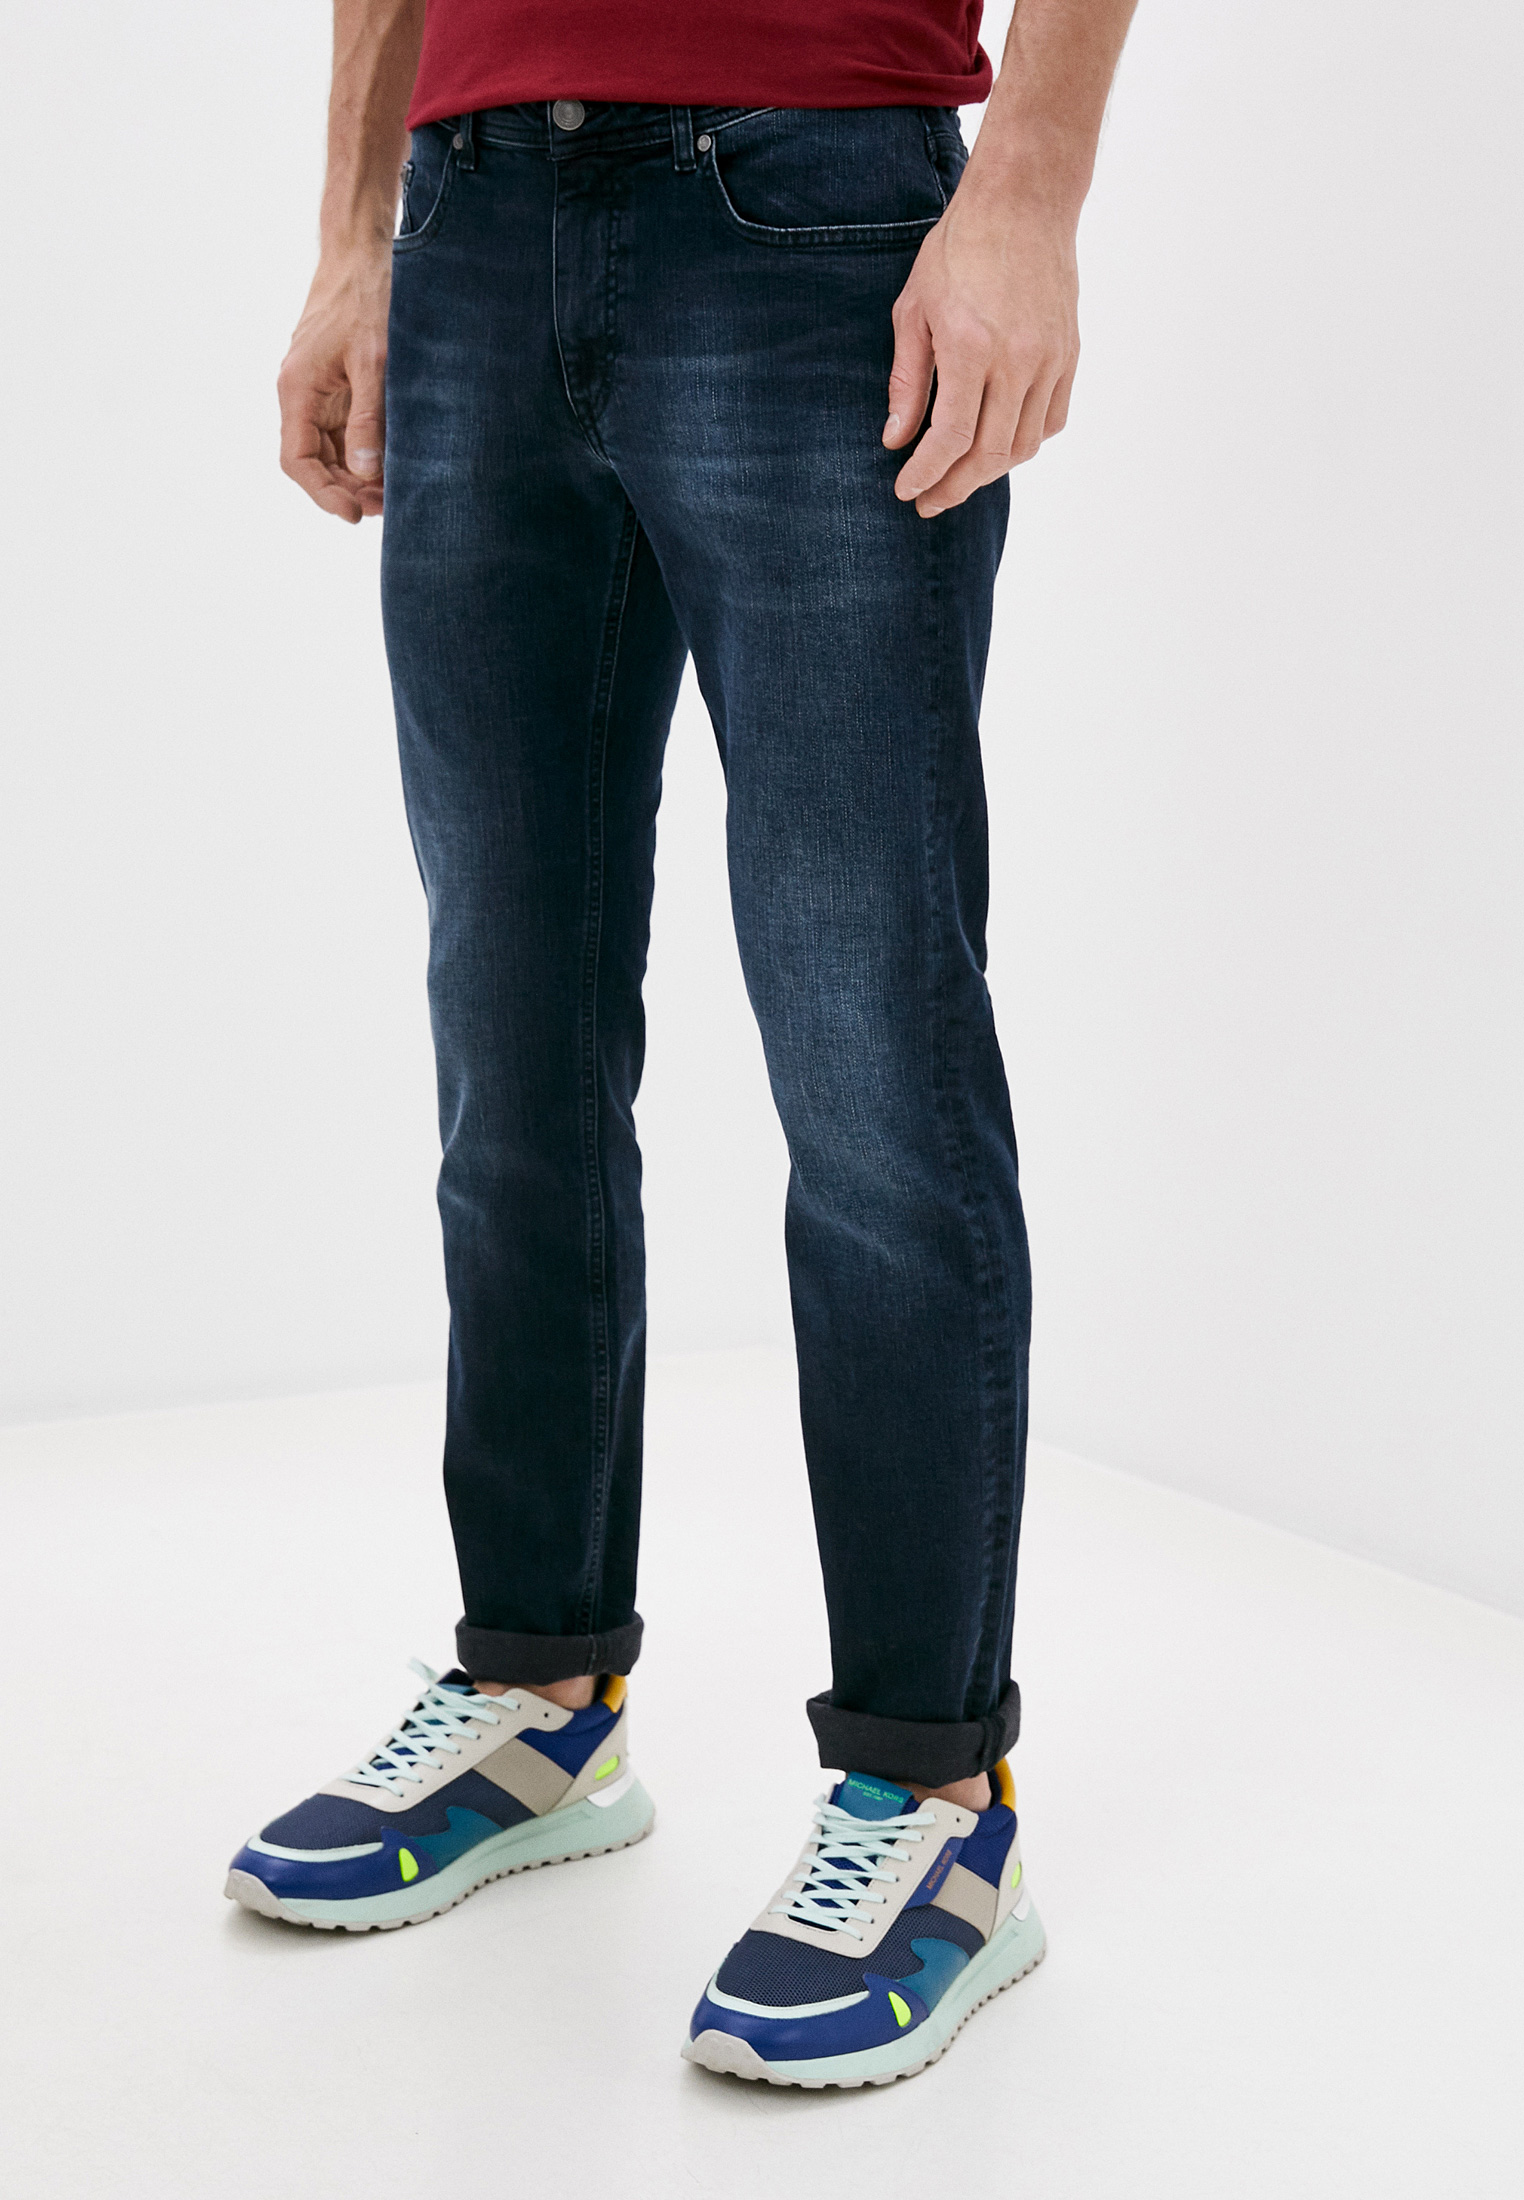 Мужские прямые джинсы Karl Lagerfeld (Карл Лагерфельд) 265800-502835